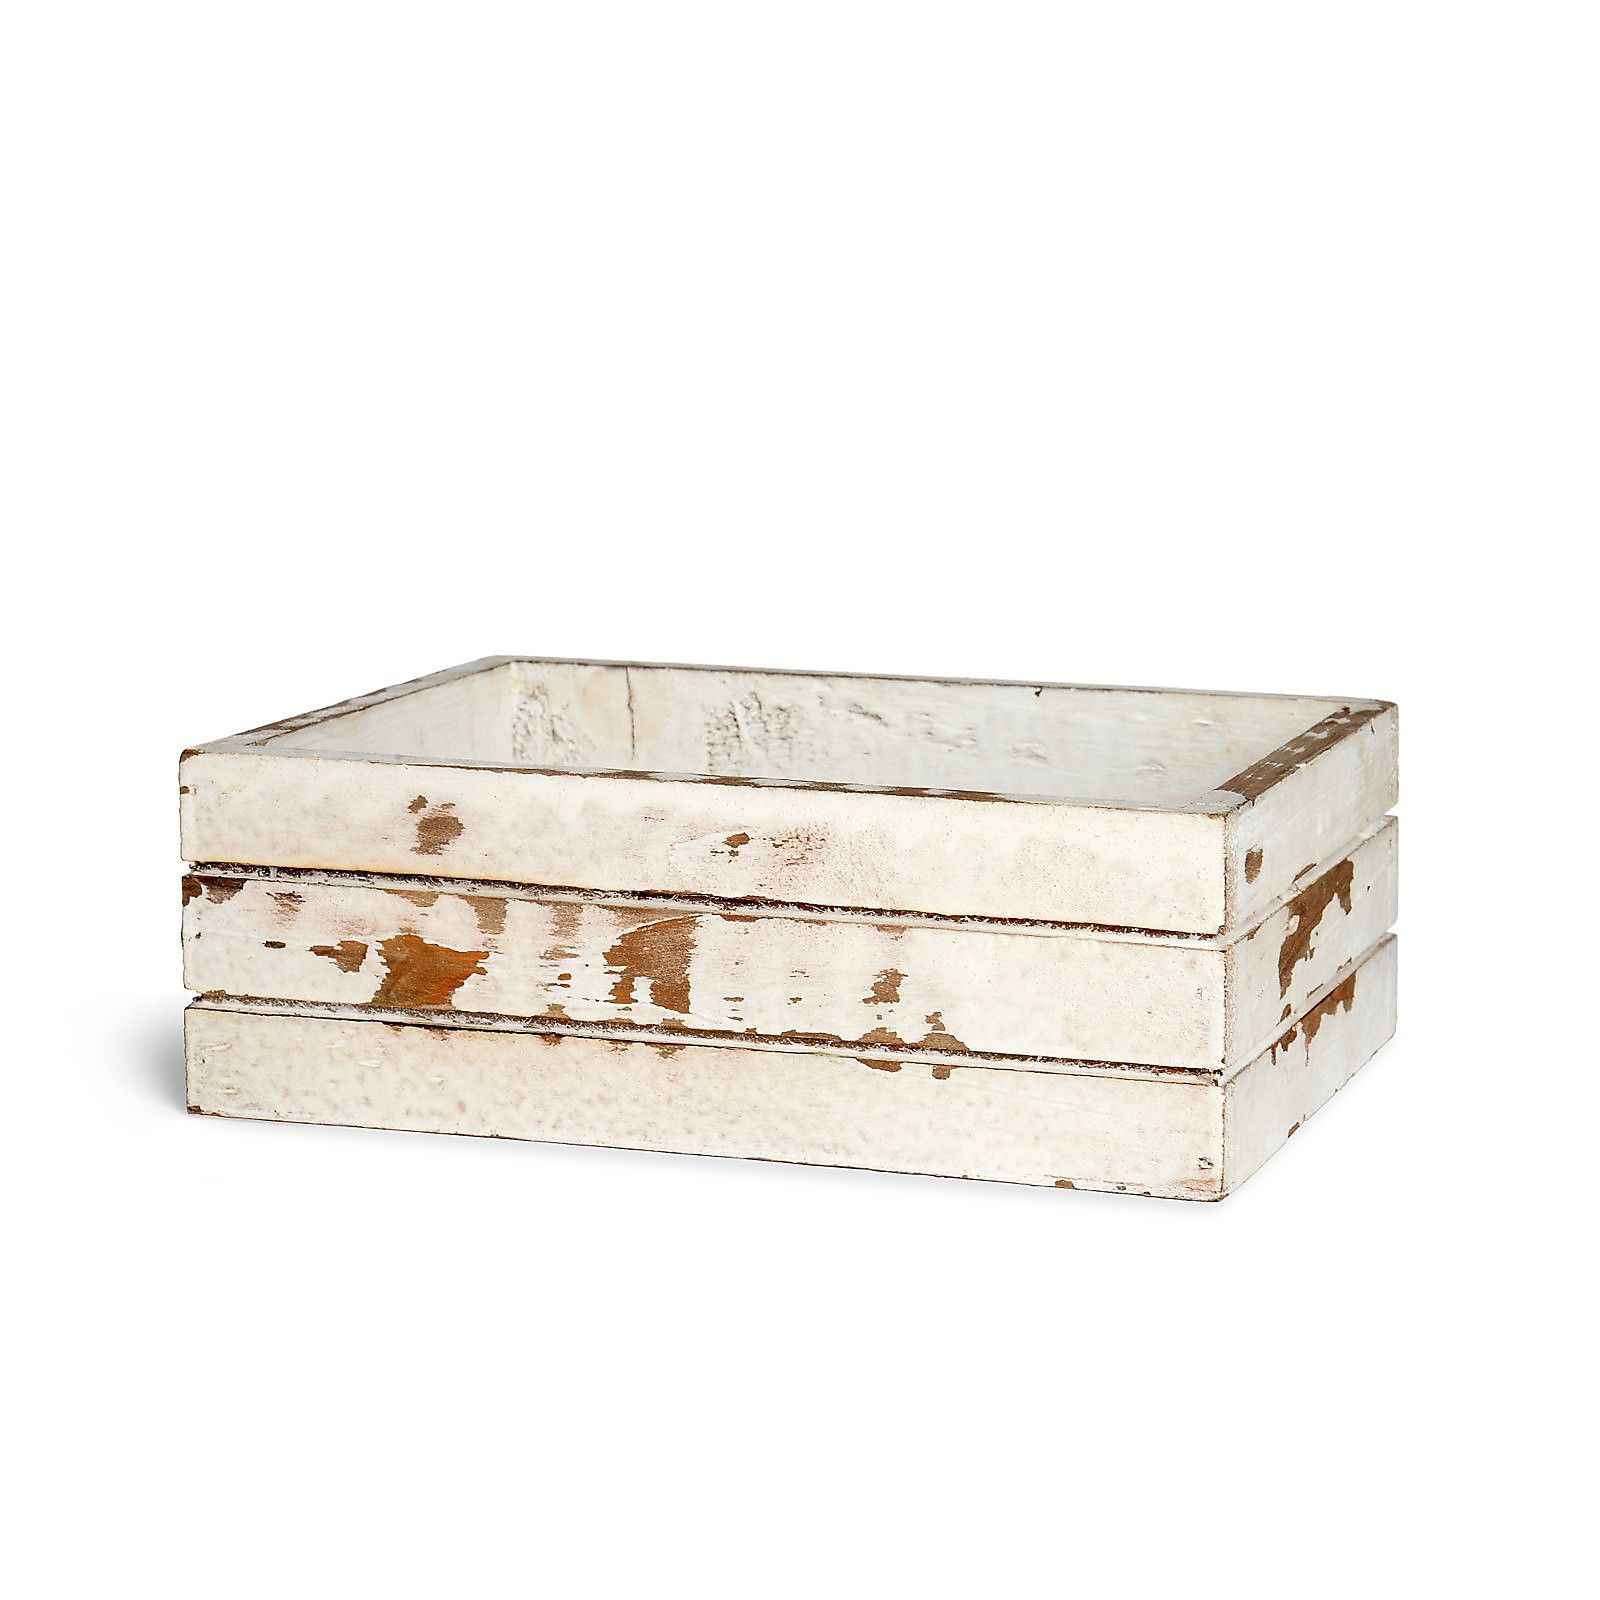 holzbox tanne weiß ca l:22 x b:14 x h:7,5 cm | casamento diy | pinterest